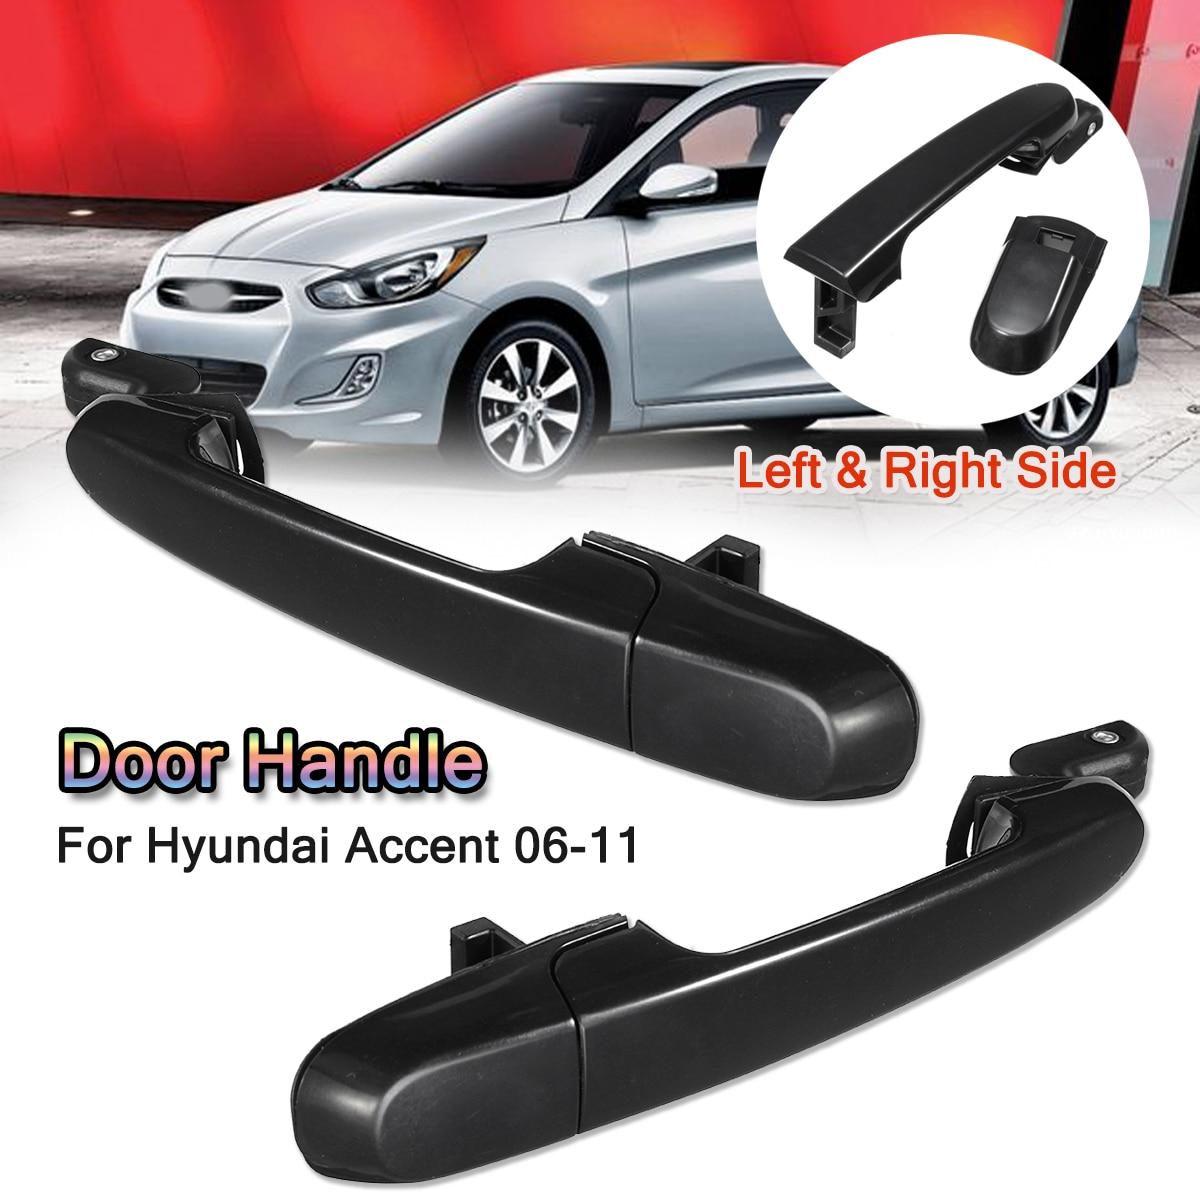 Hyundai Accent 1994-1999 Rear Left Door Outside Exterior Handle